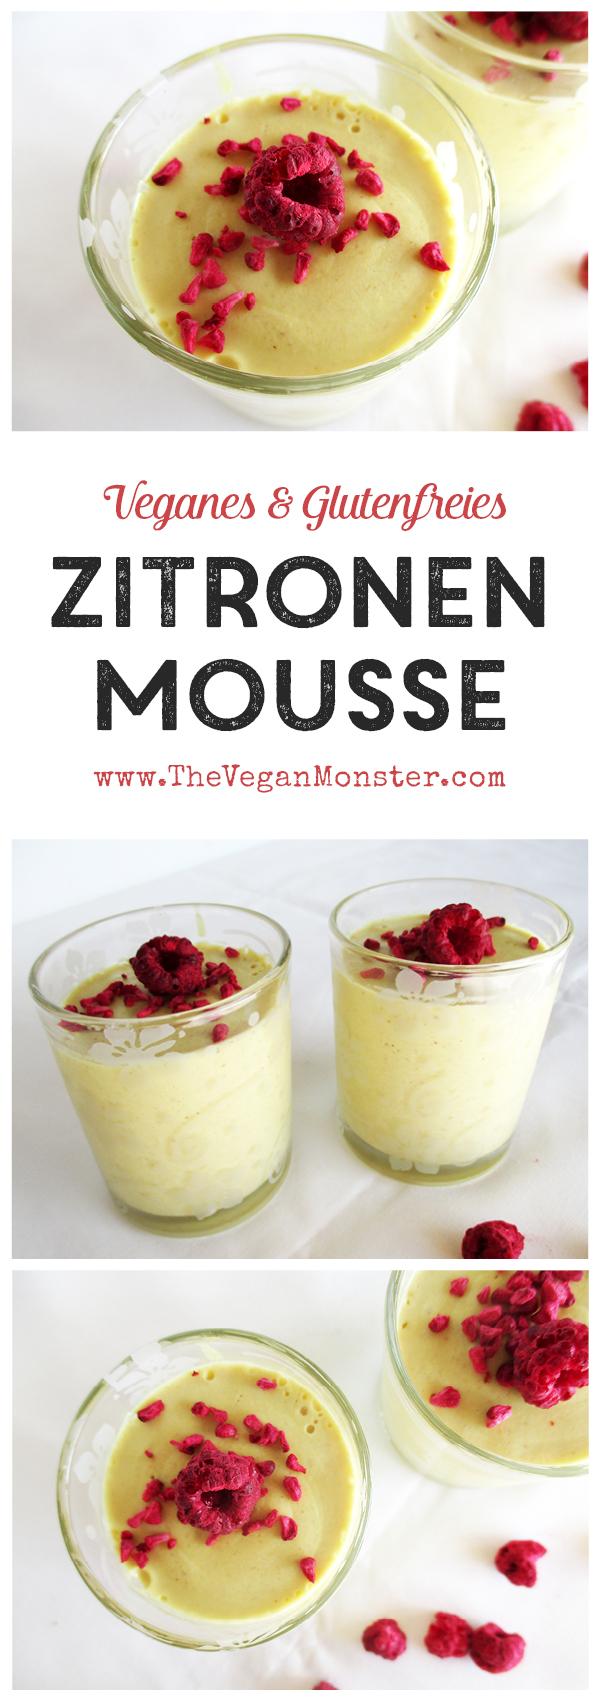 Veganes Glutenfreies Milchfreies Zitronen Kokos Mousse